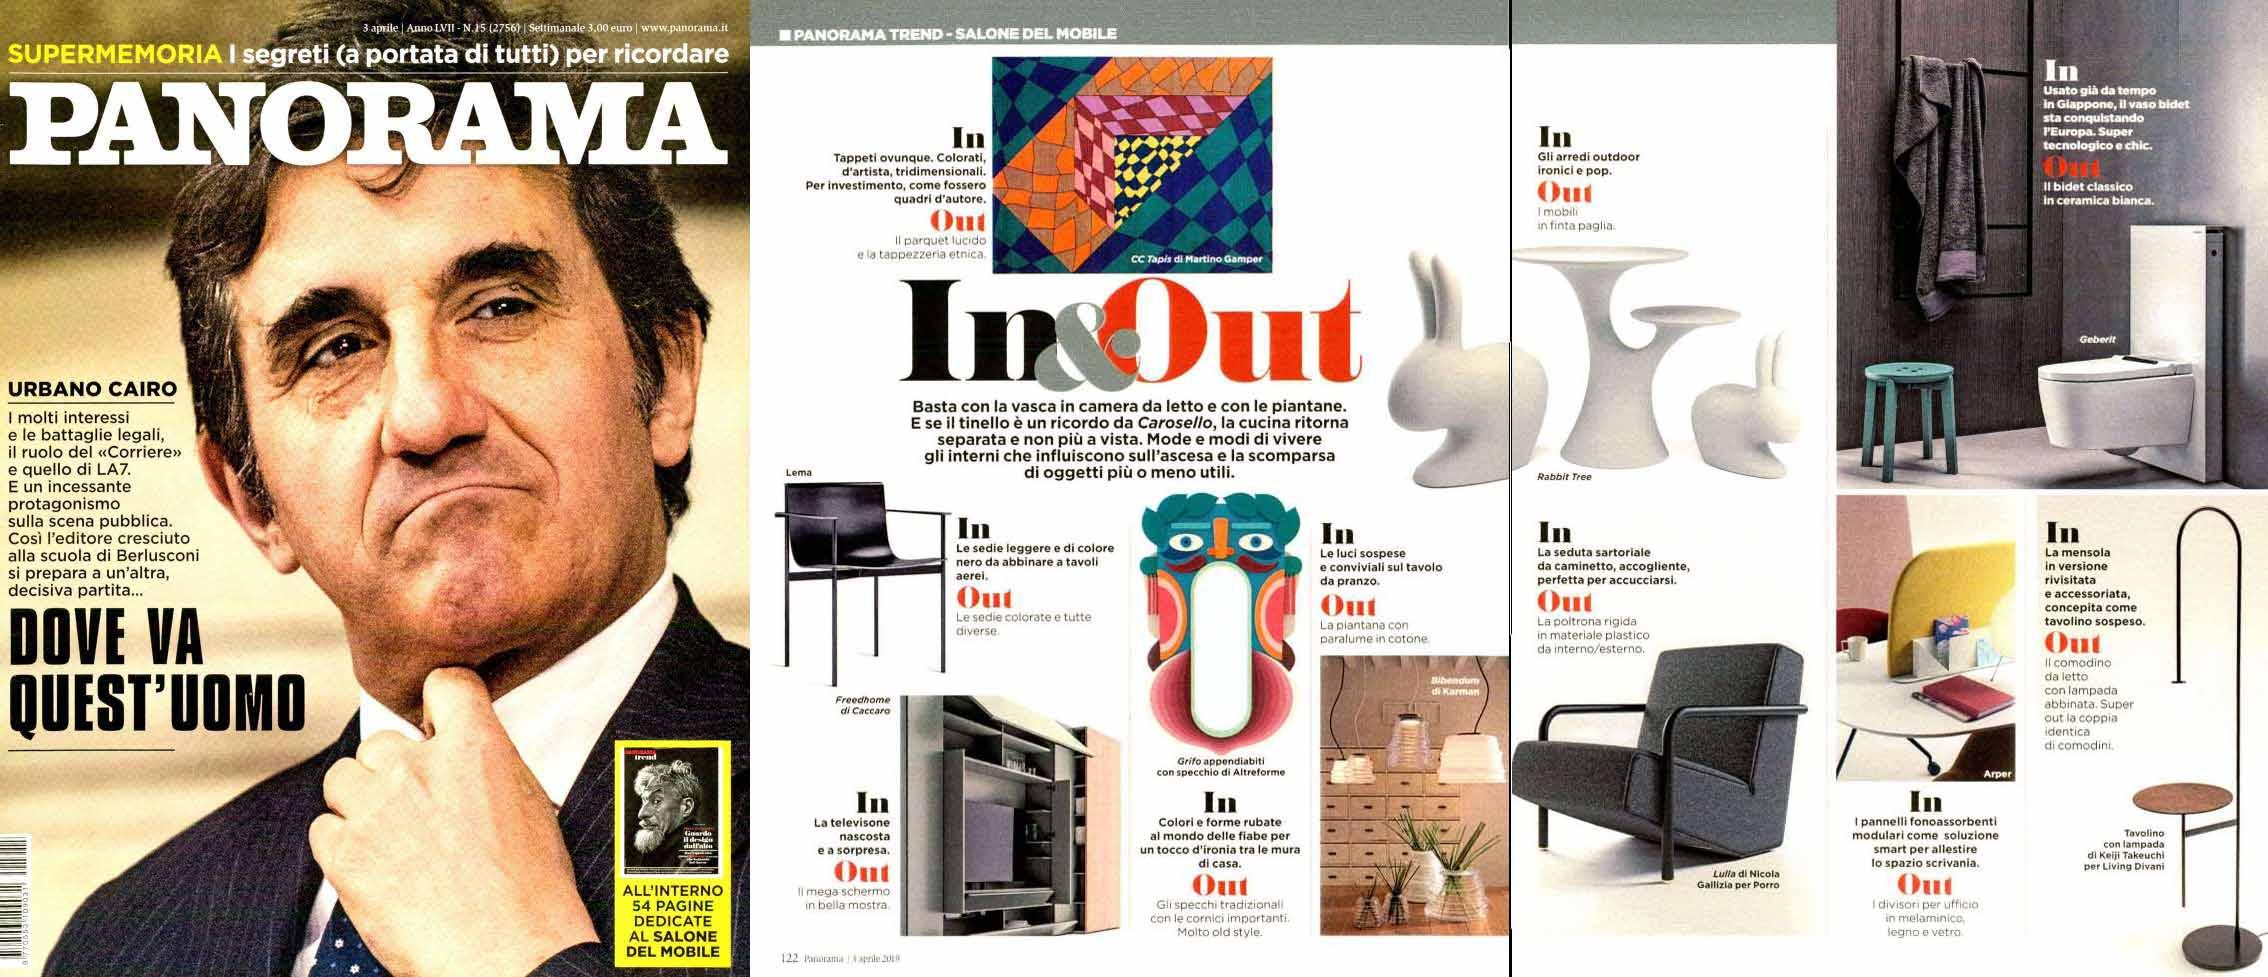 Maison Du Monde Appendiabiti A Muro.Altreforme Furniture With Wow Effect Press